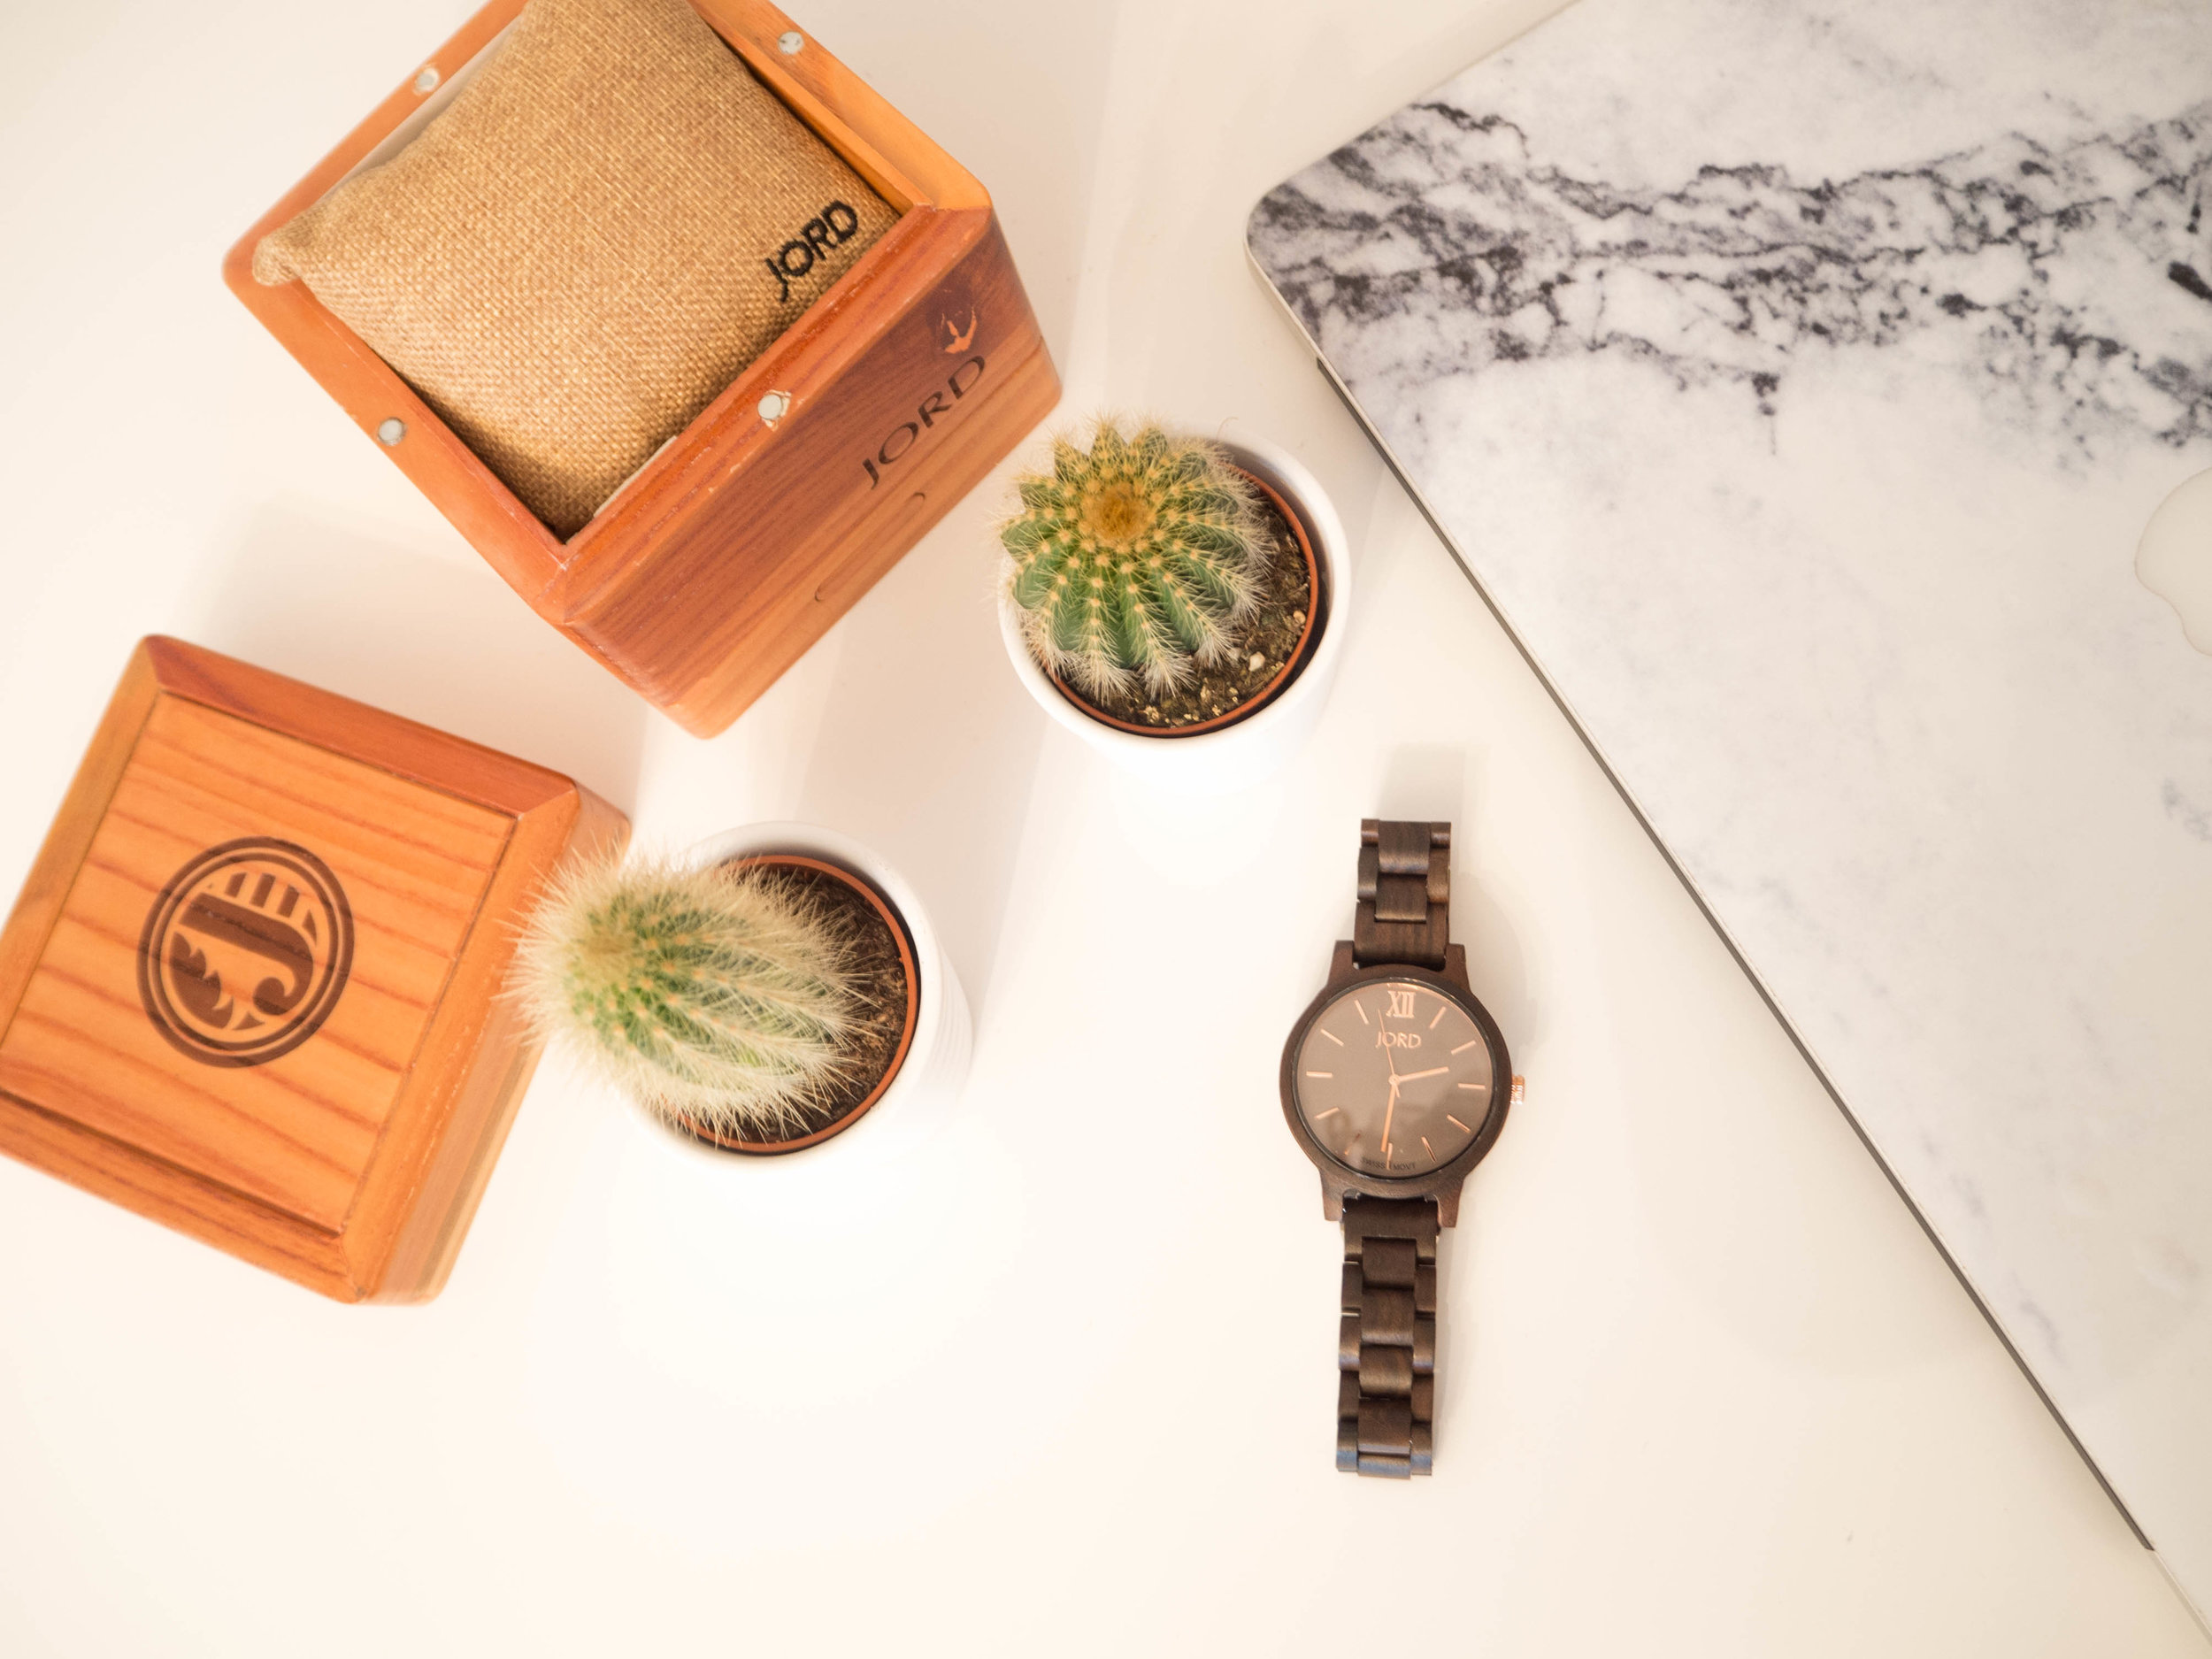 "<!-- JORD WOOD WATCHES ARTICLE WIDGET START --> <a id=""woodwatches_com_widget_article""  ishidden=""1""  title=""Luxury Wood Watch"">Luxury Wood Watch</a> <script src=""//www.woodwatches.com/widget-article/houselust""  type=""text/javascript""></script> <!-- JORD WOOD WATCHES ARTICLE WIDGET END -->"